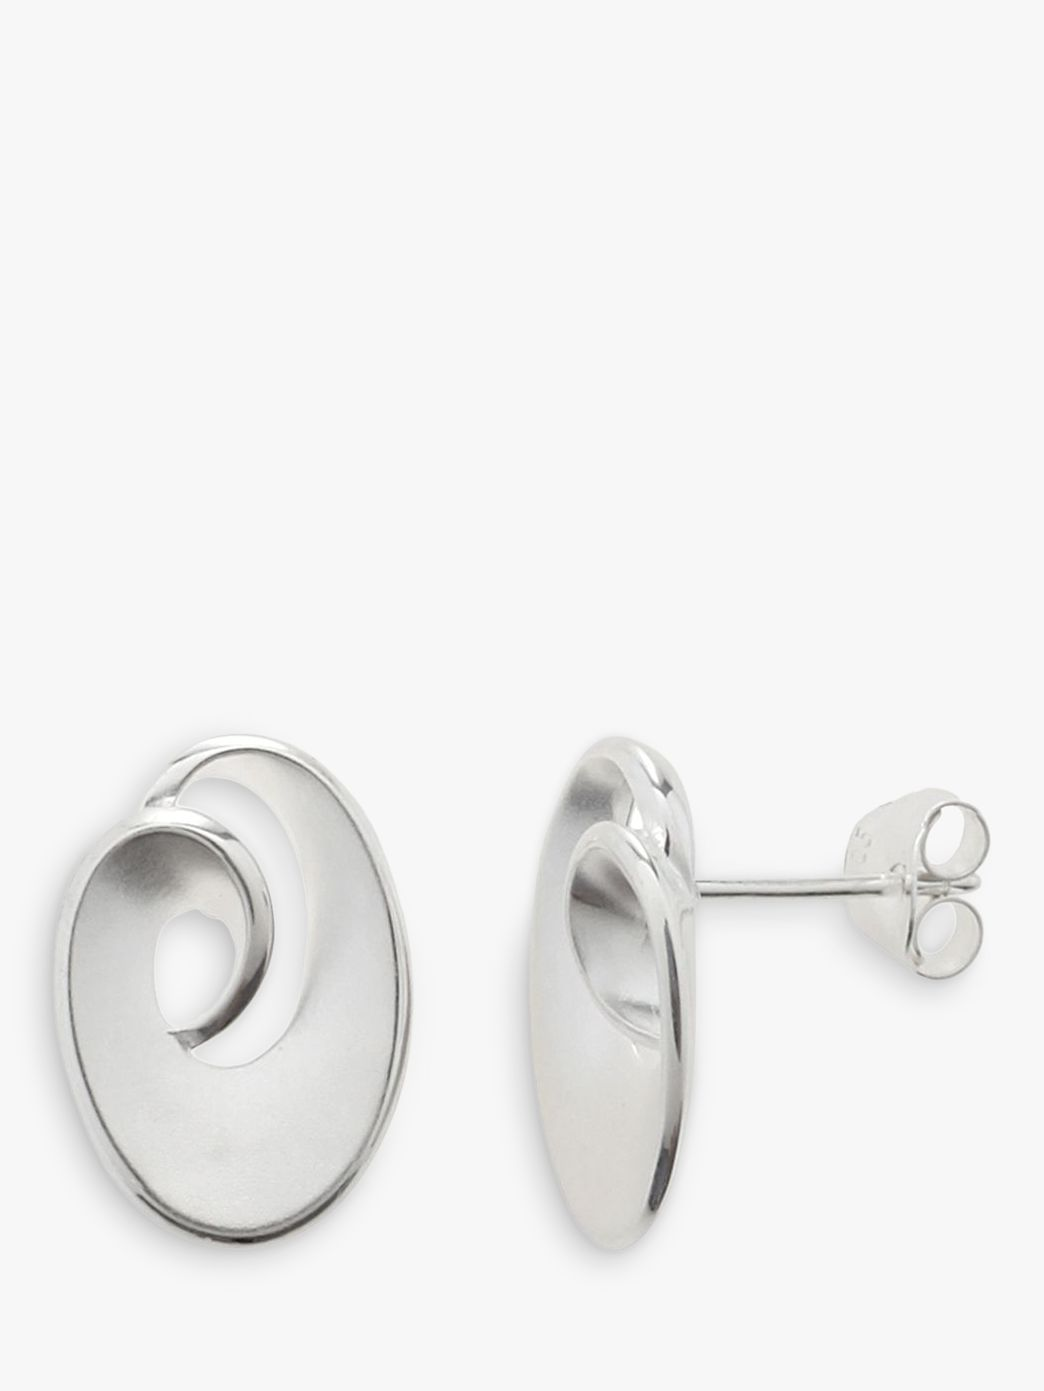 Nina B Nina B Sterling Silver Satin Finish Swirl Stud Earrings